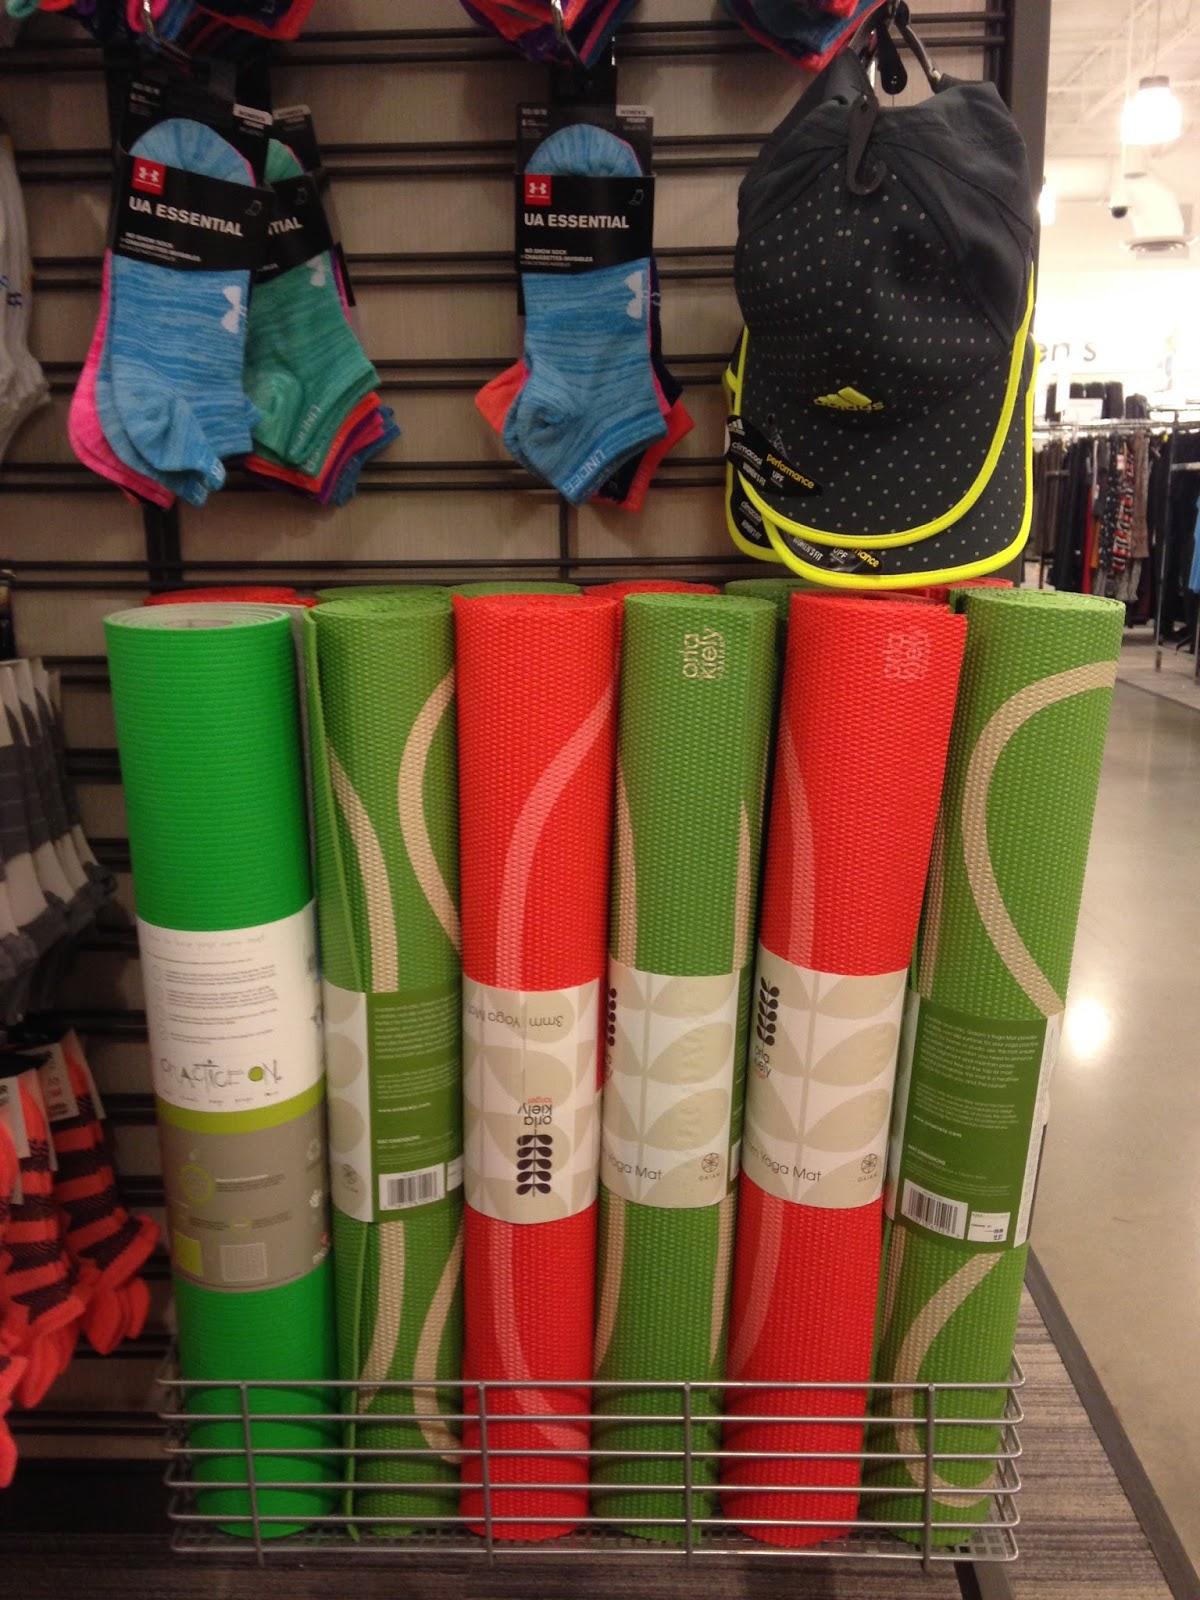 I Love Orla Kiely Orla Kiely Yoga Items At Nordstrom Rack